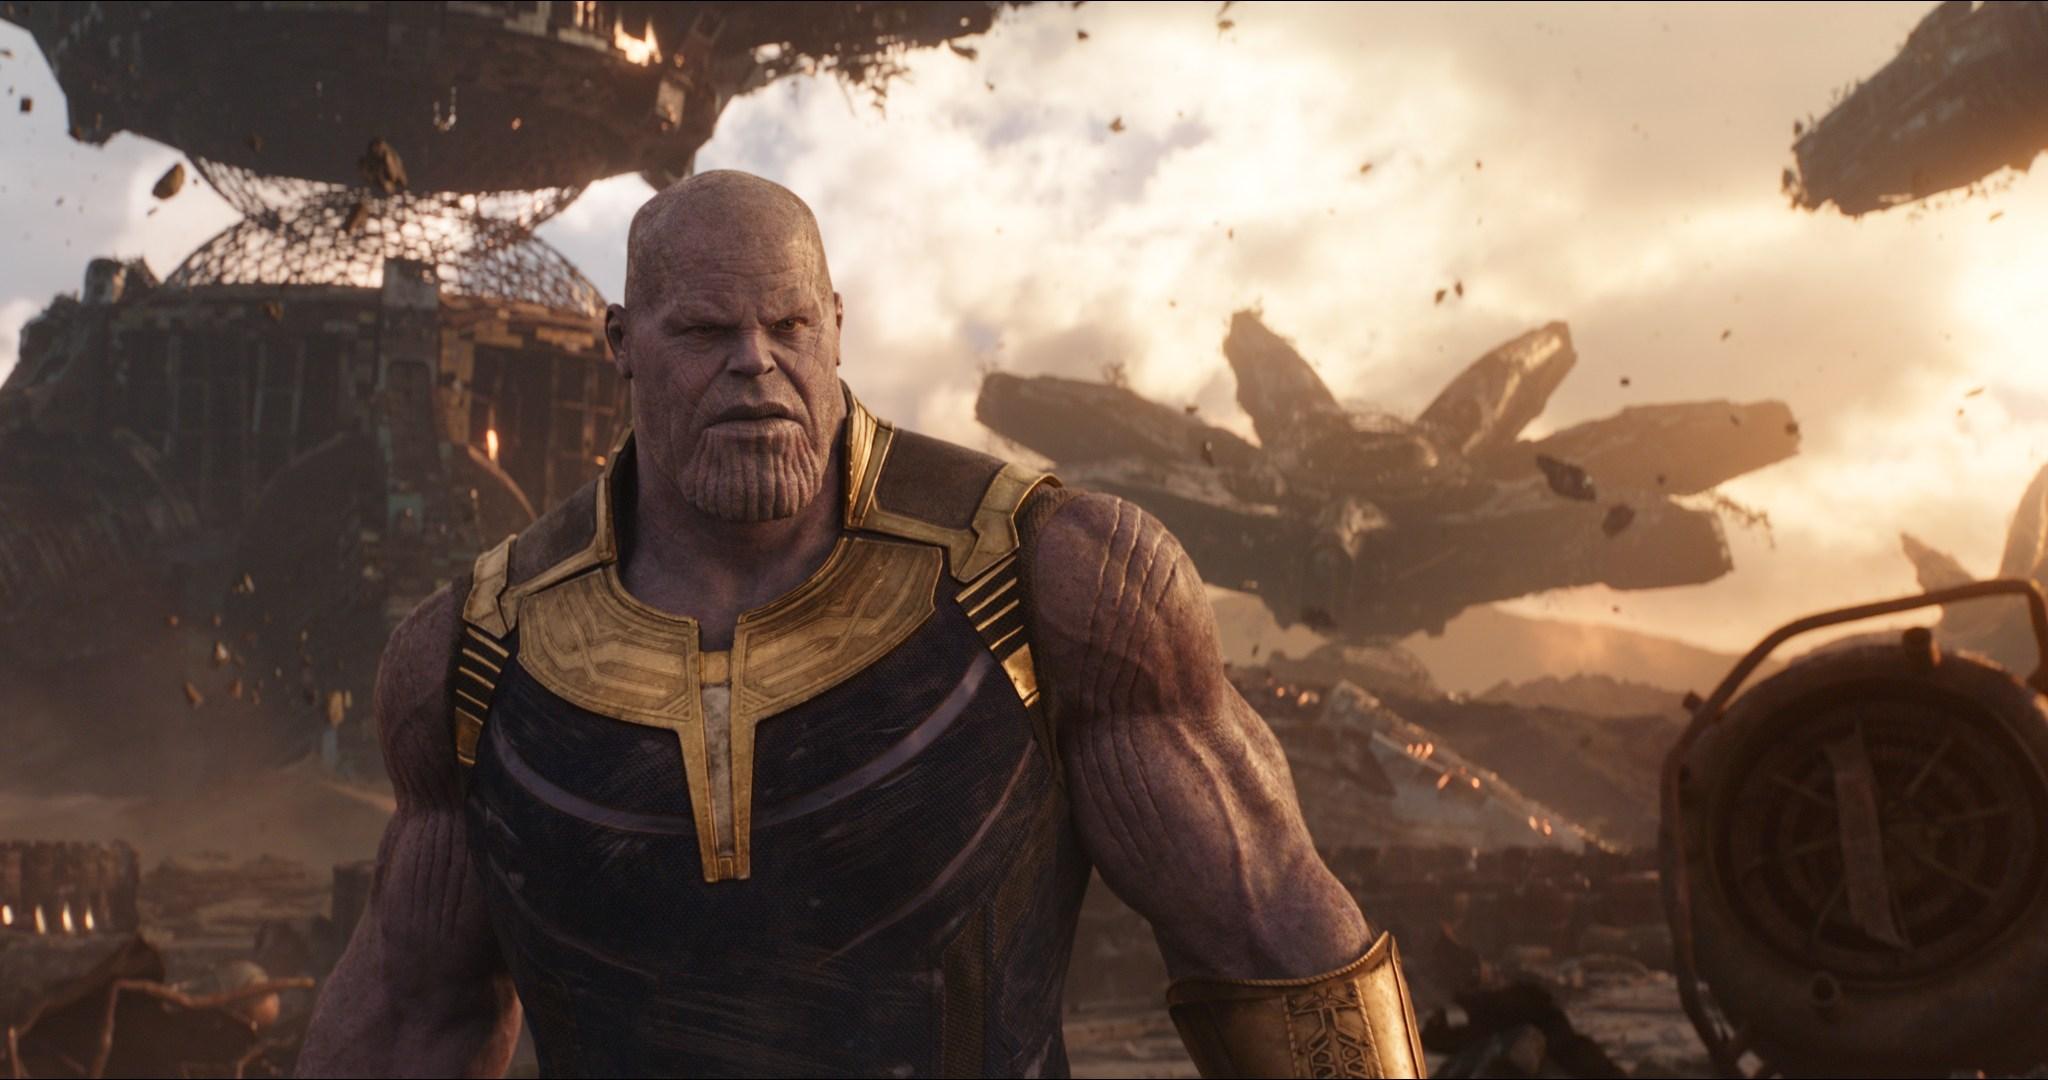 Cute Love Quotes Mobile Wallpapers Wallpaper Avengers Infinity War Thanos 4k Avenger